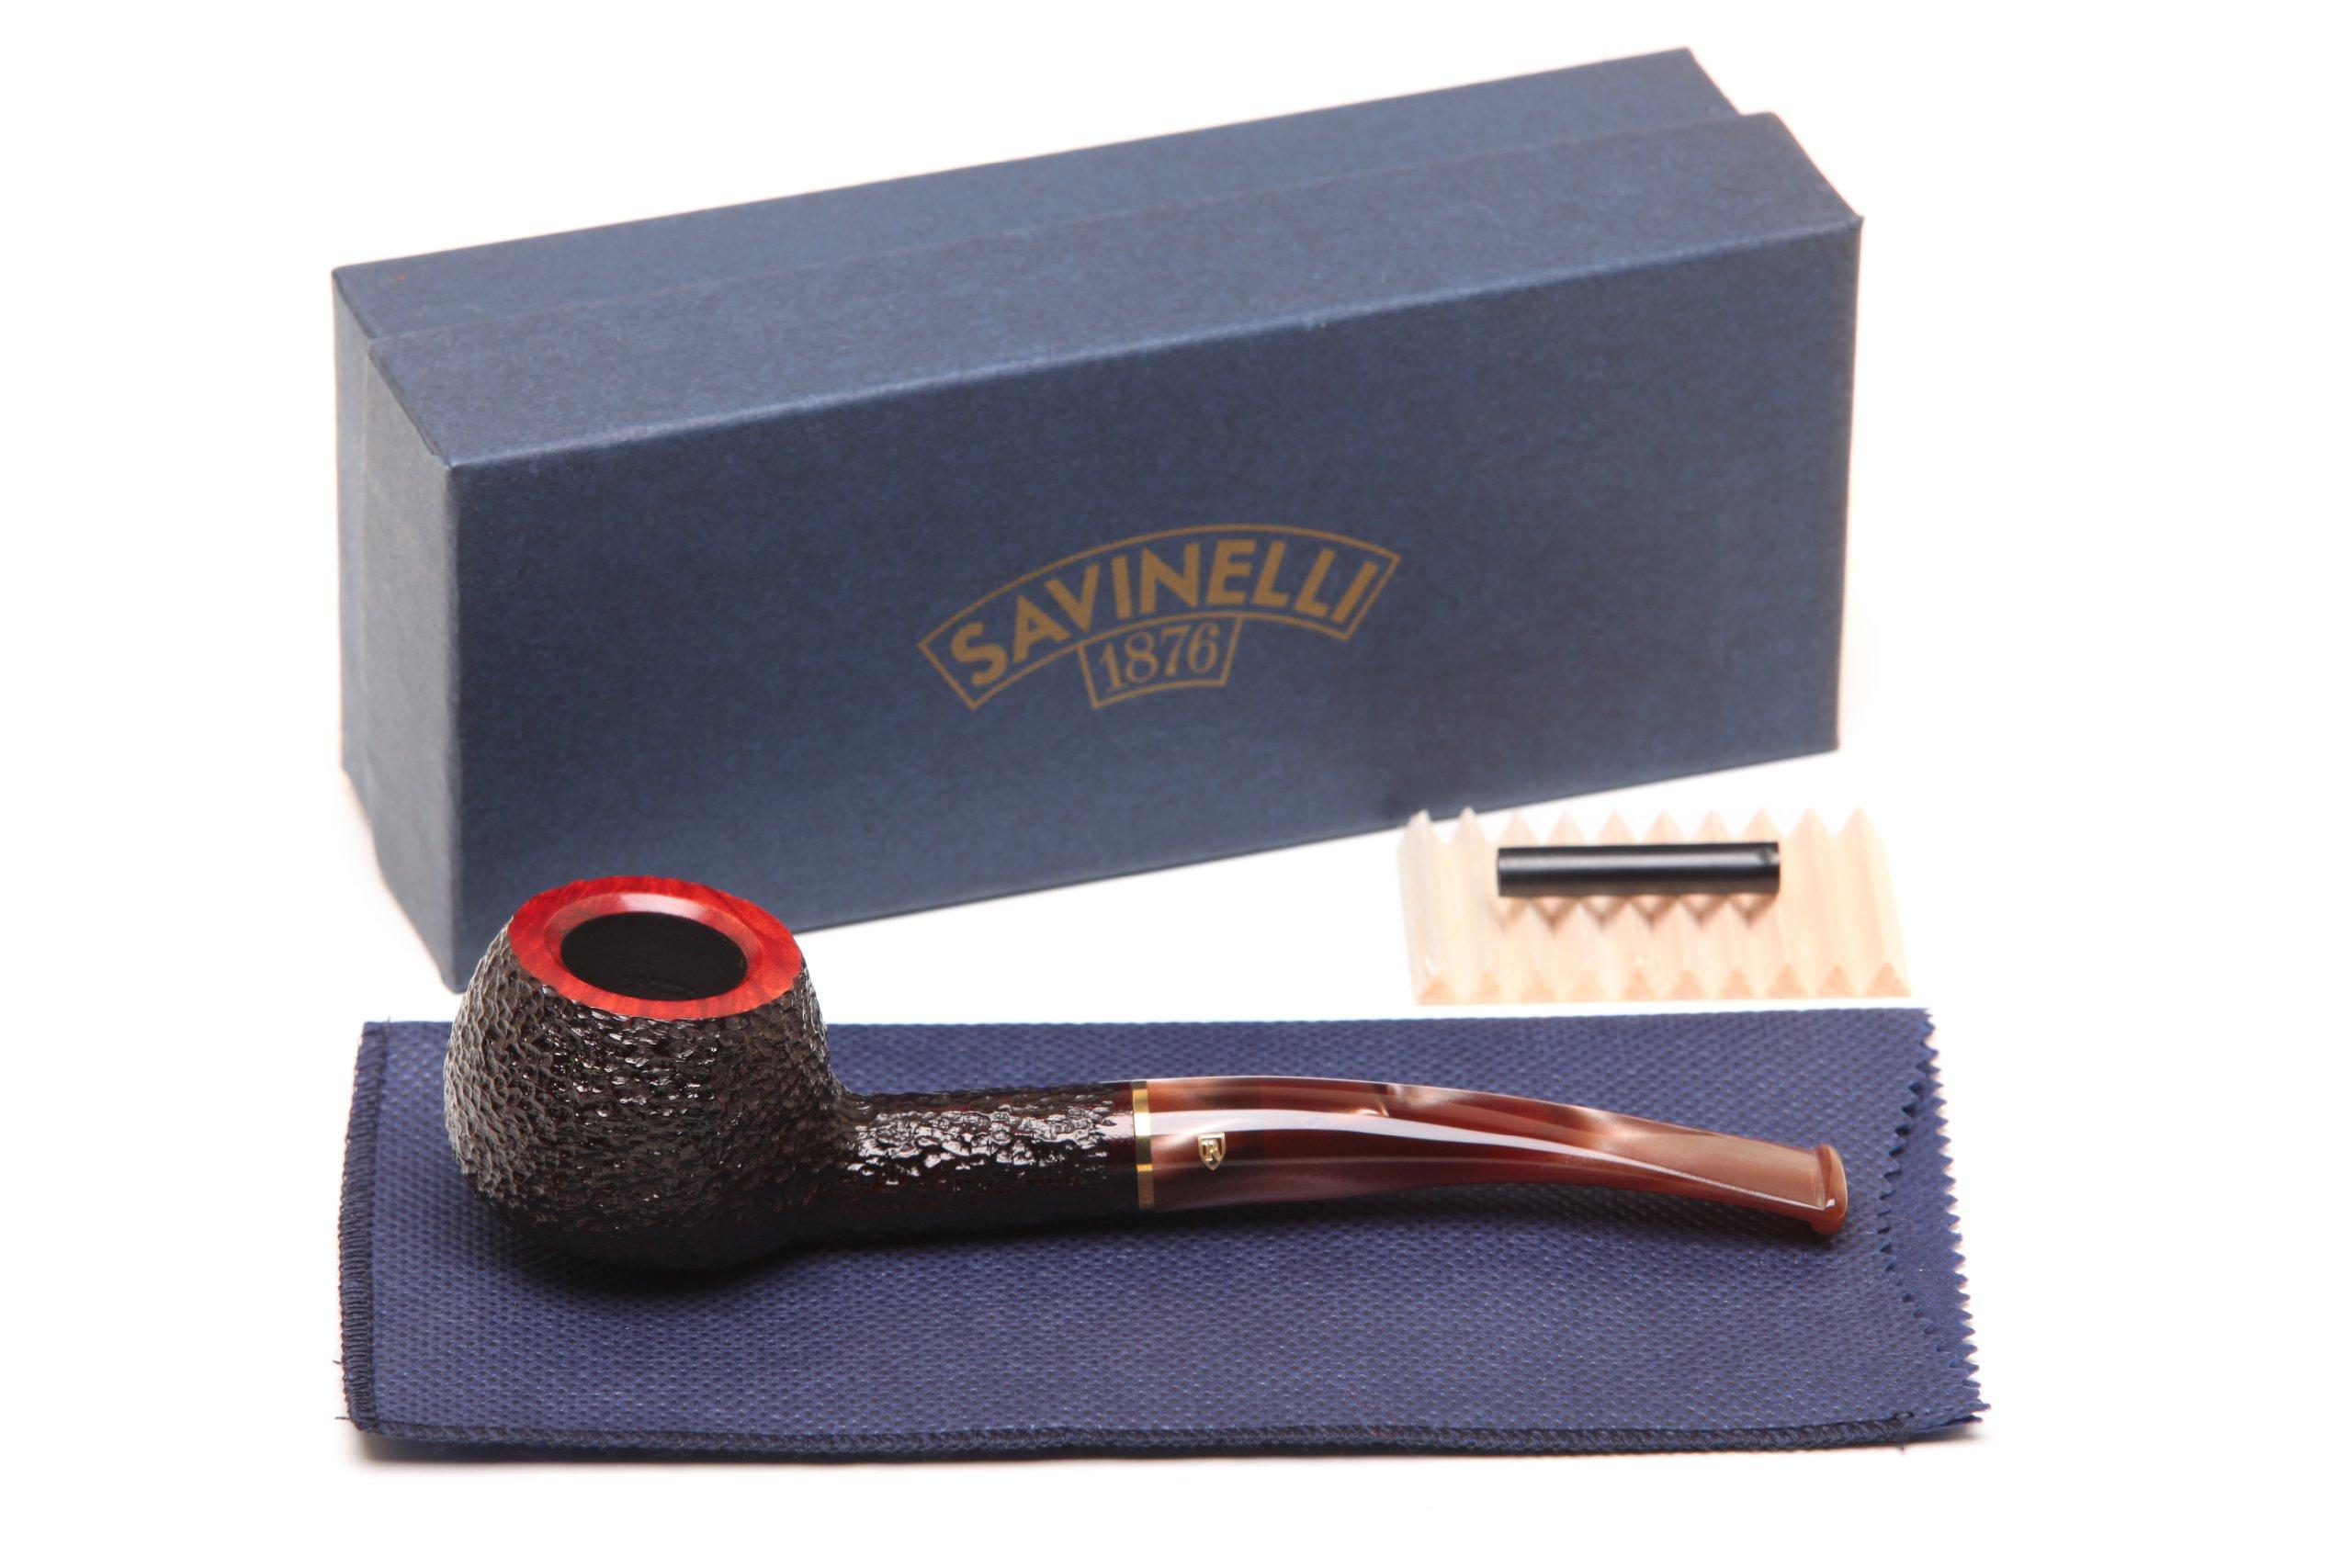 Savinelli Roma Rustic 315 KS Lucite Stem Tobacco Pipe